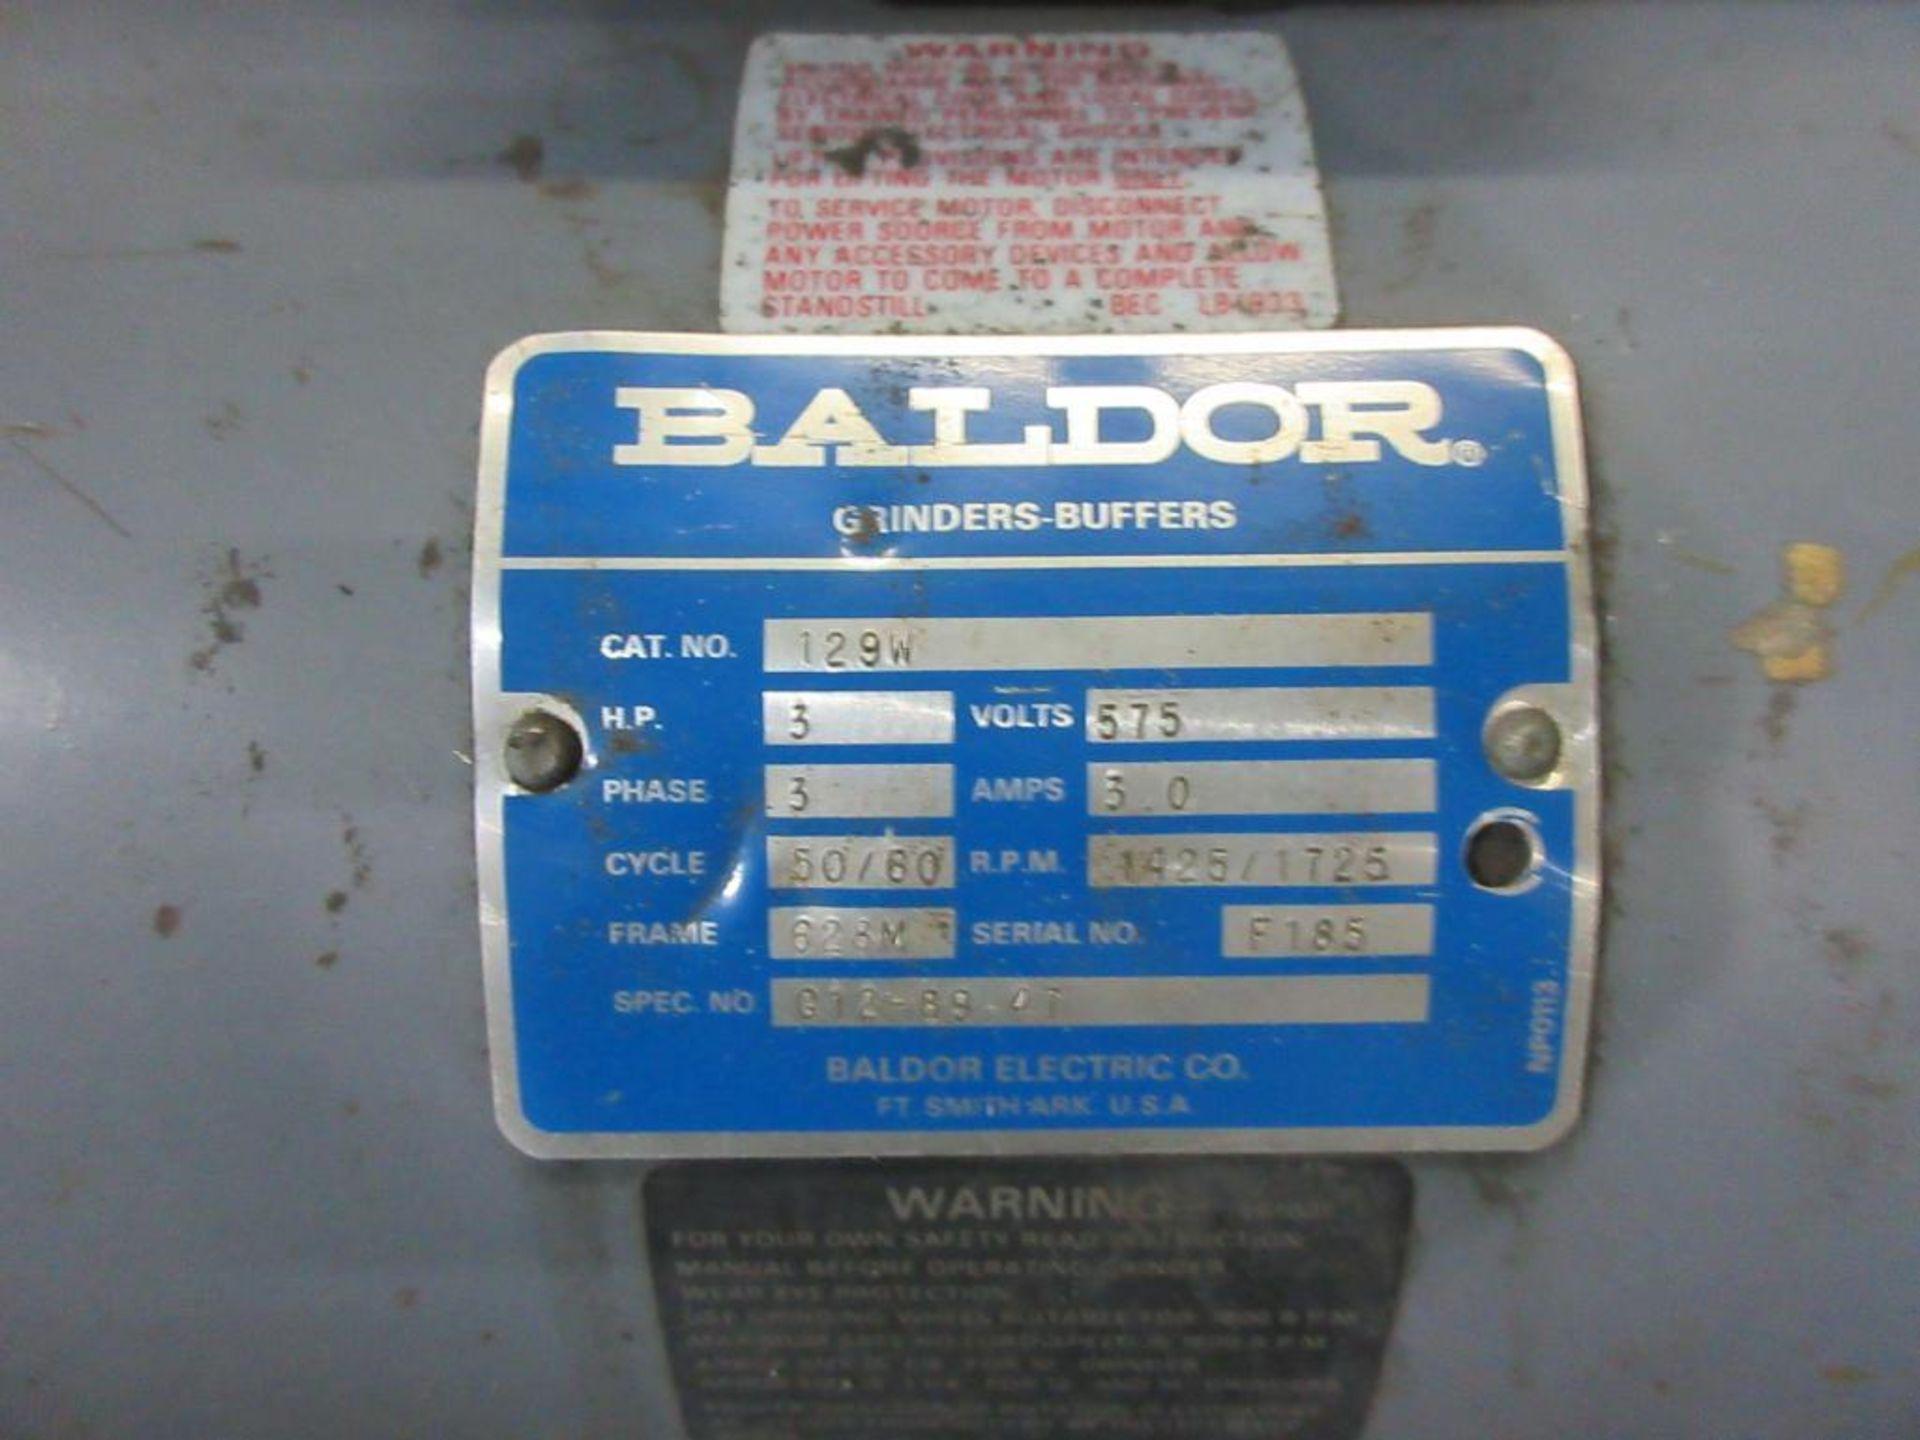 BALDOR DUAL PEDESTAL GRINDER 3 HP, SPARE GRINDING WHEEL - Image 3 of 4